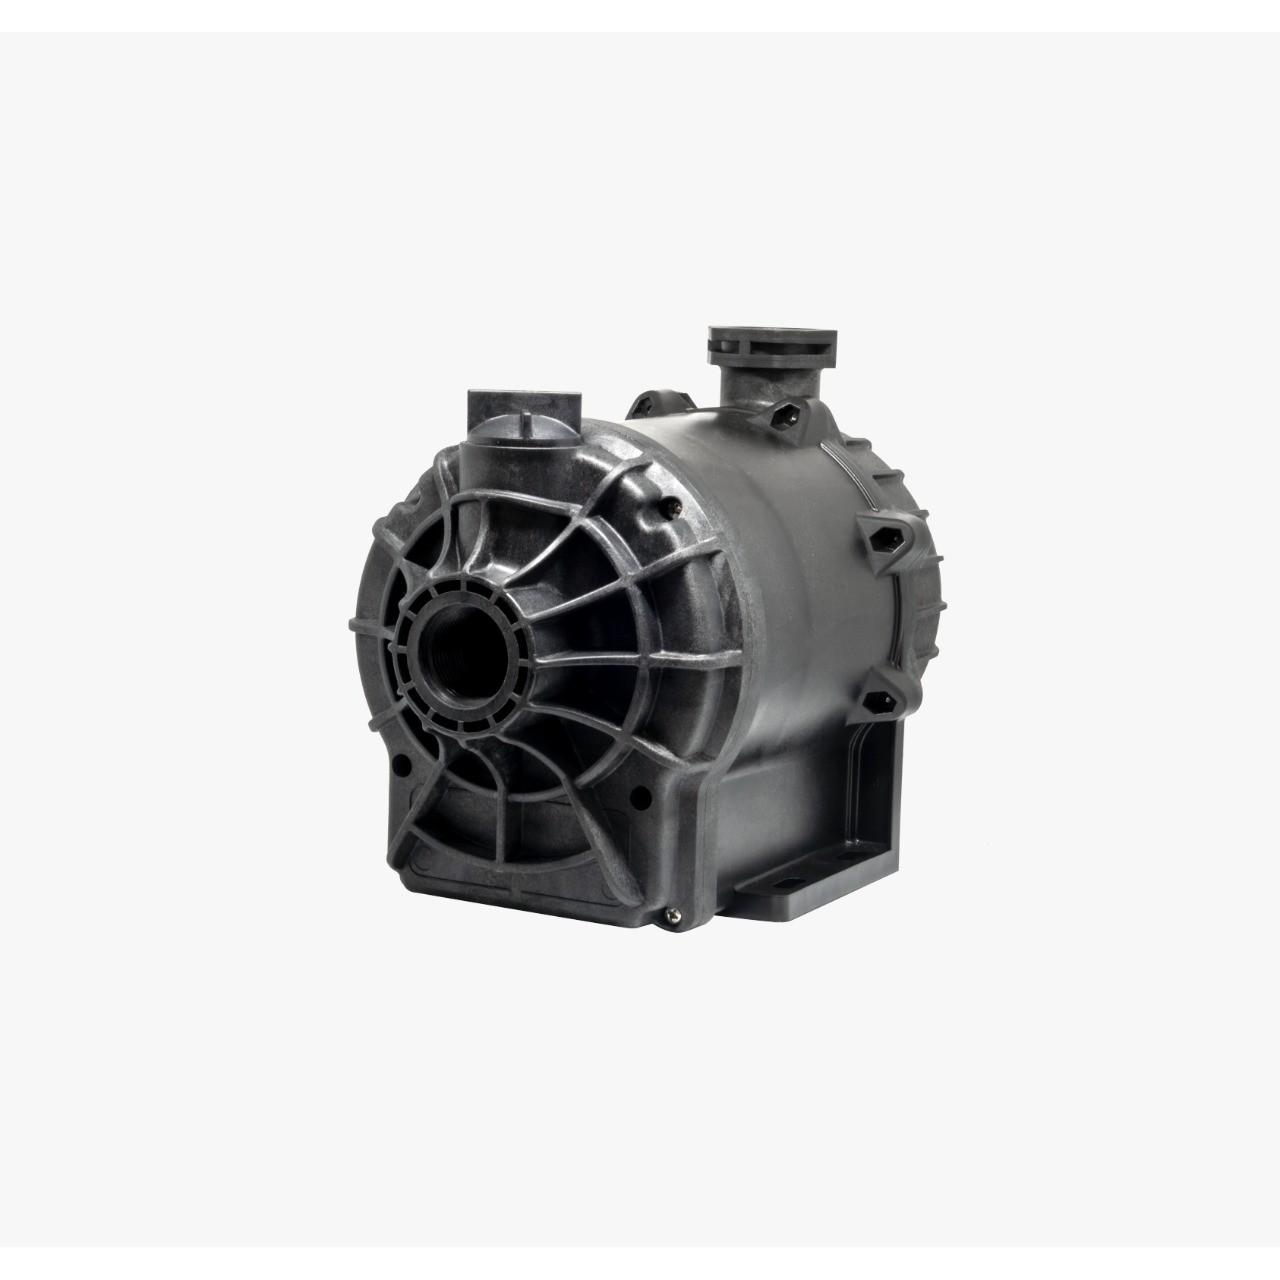 Bomba Centrifuga Monofasico 15 cv 220V MB63 - Syllent